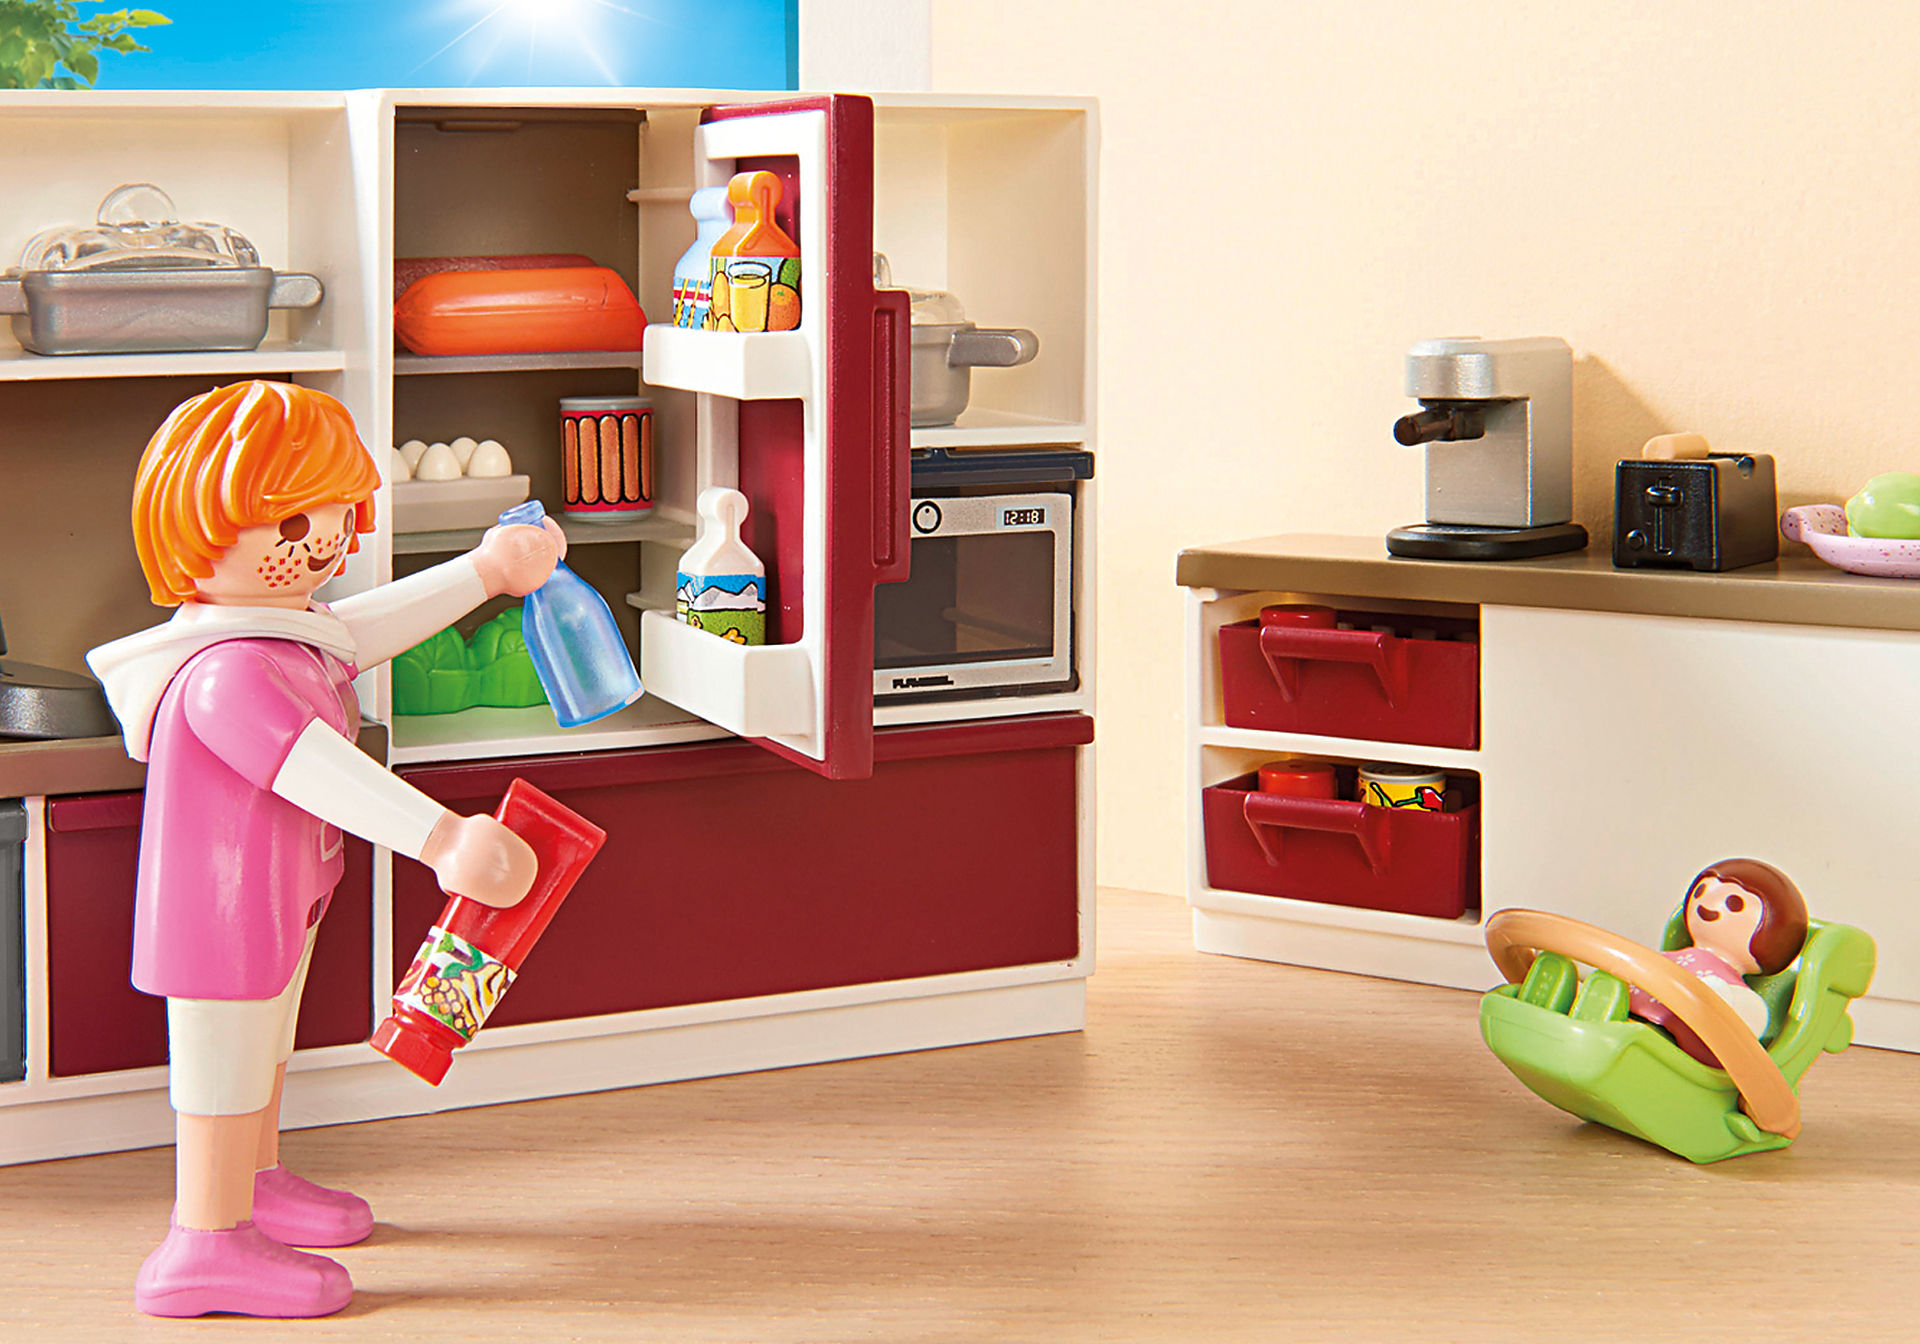 http://media.playmobil.com/i/playmobil/9269_product_extra3/Duża rodzinna kuchnia